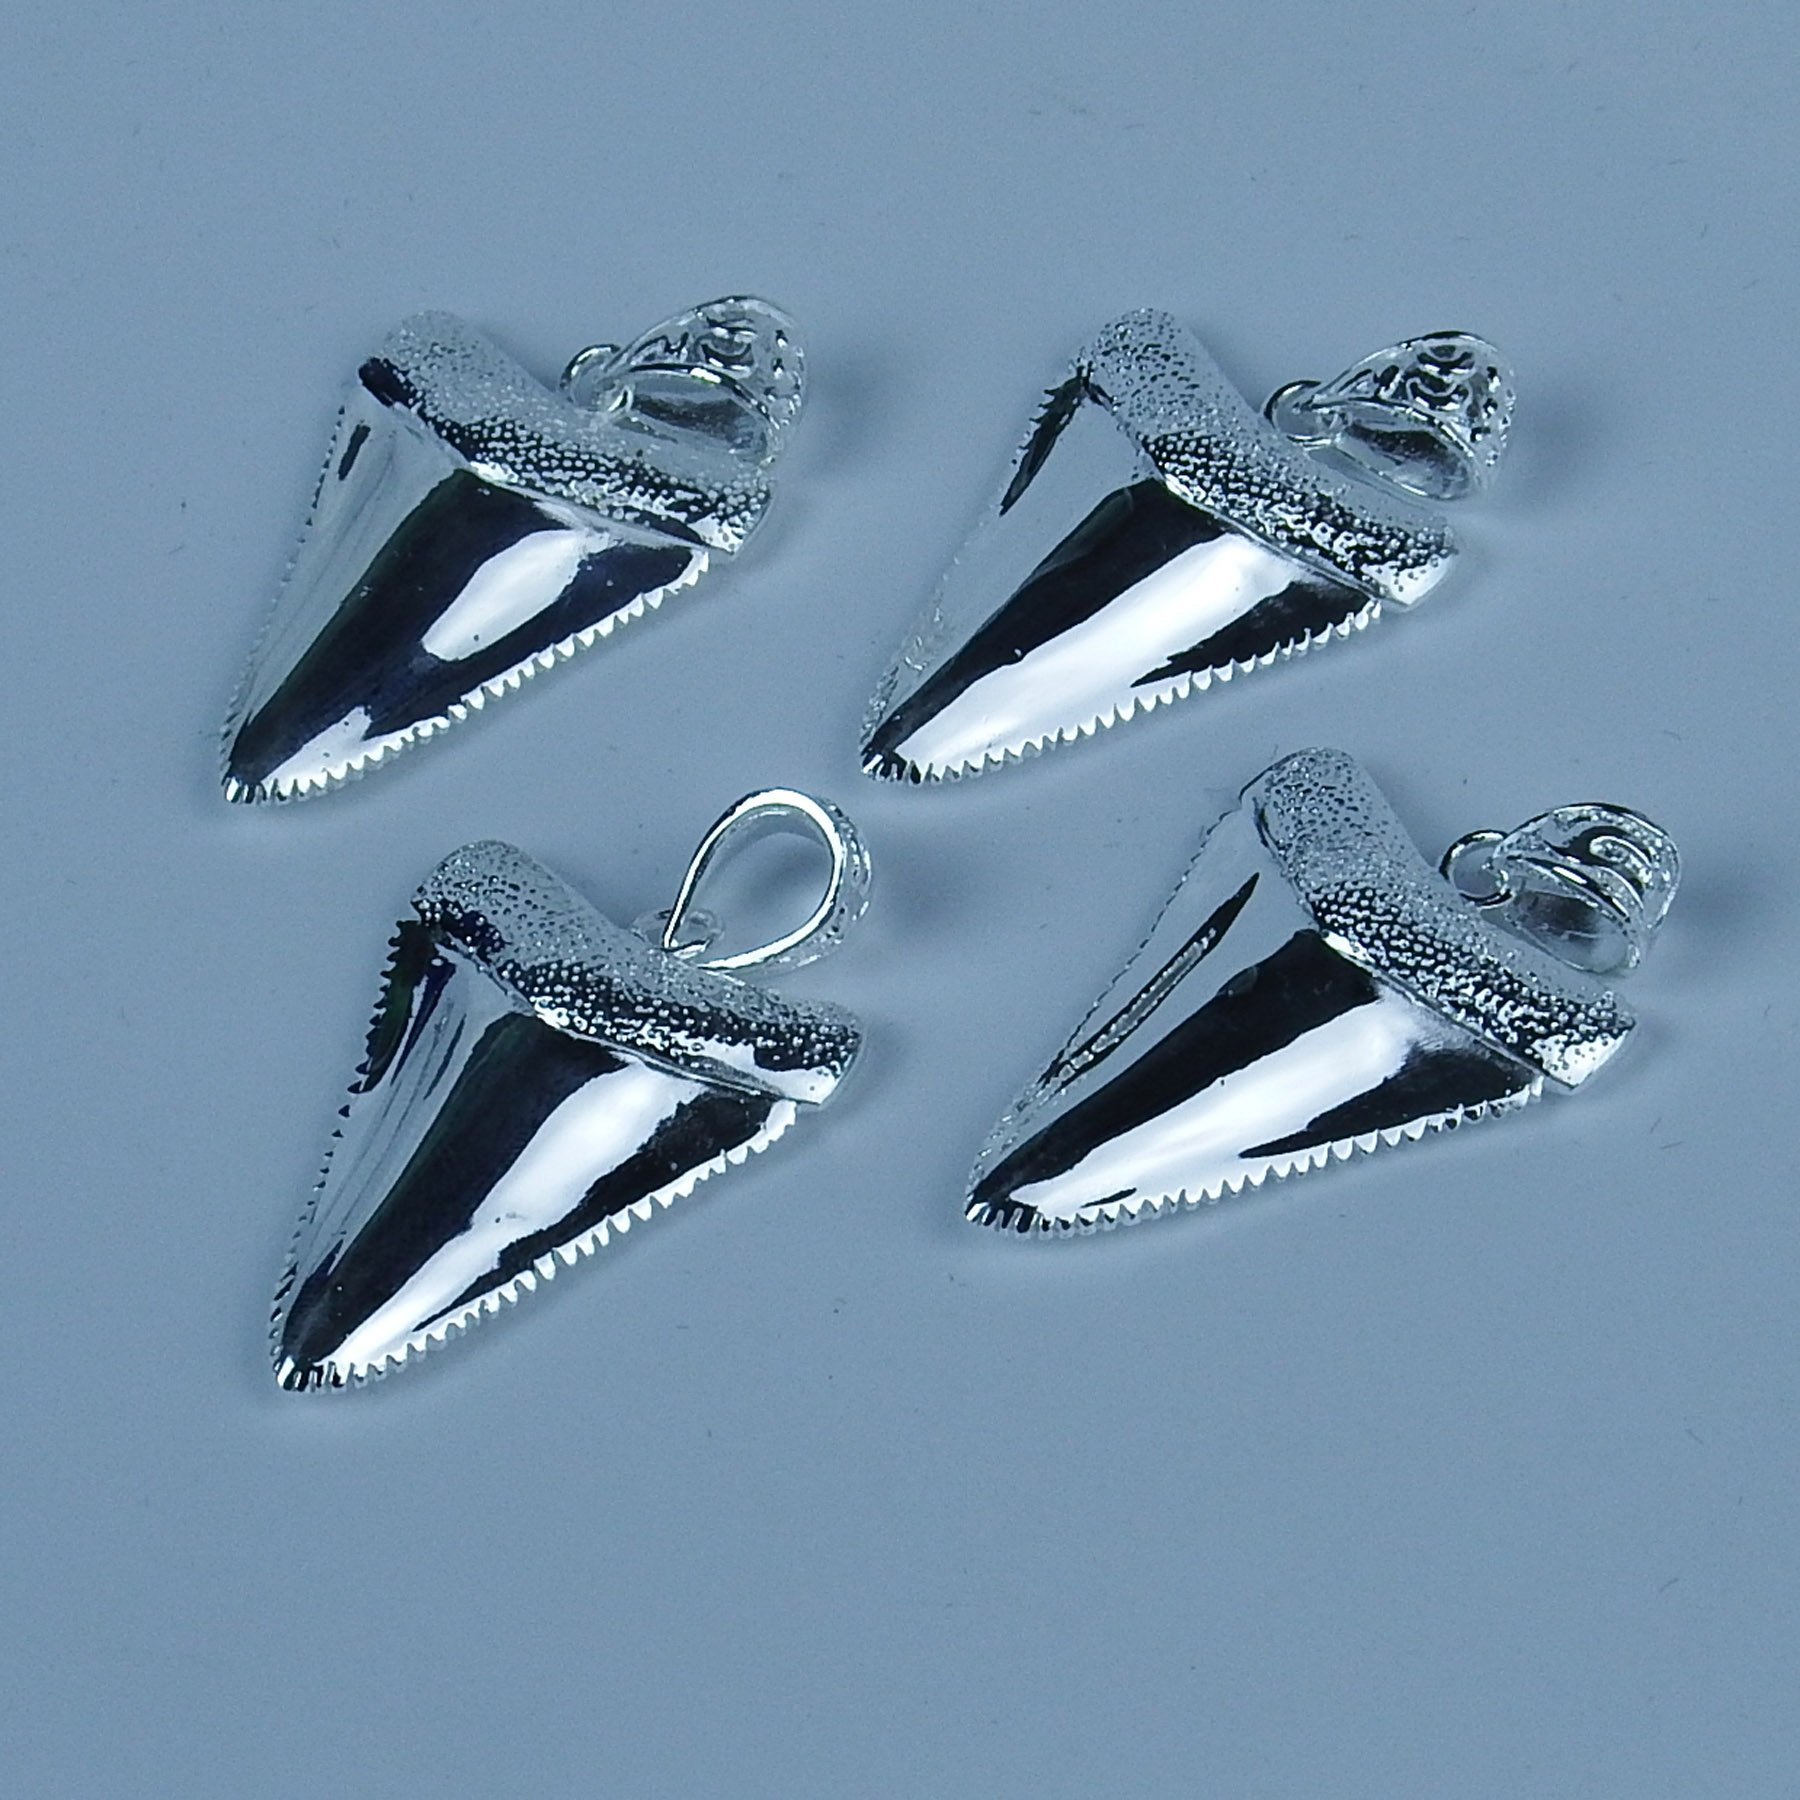 GemShark 15g Sterling Silver Necklace Pendant Great White Shark Tooth for Men Women by GemShark (Image #5)